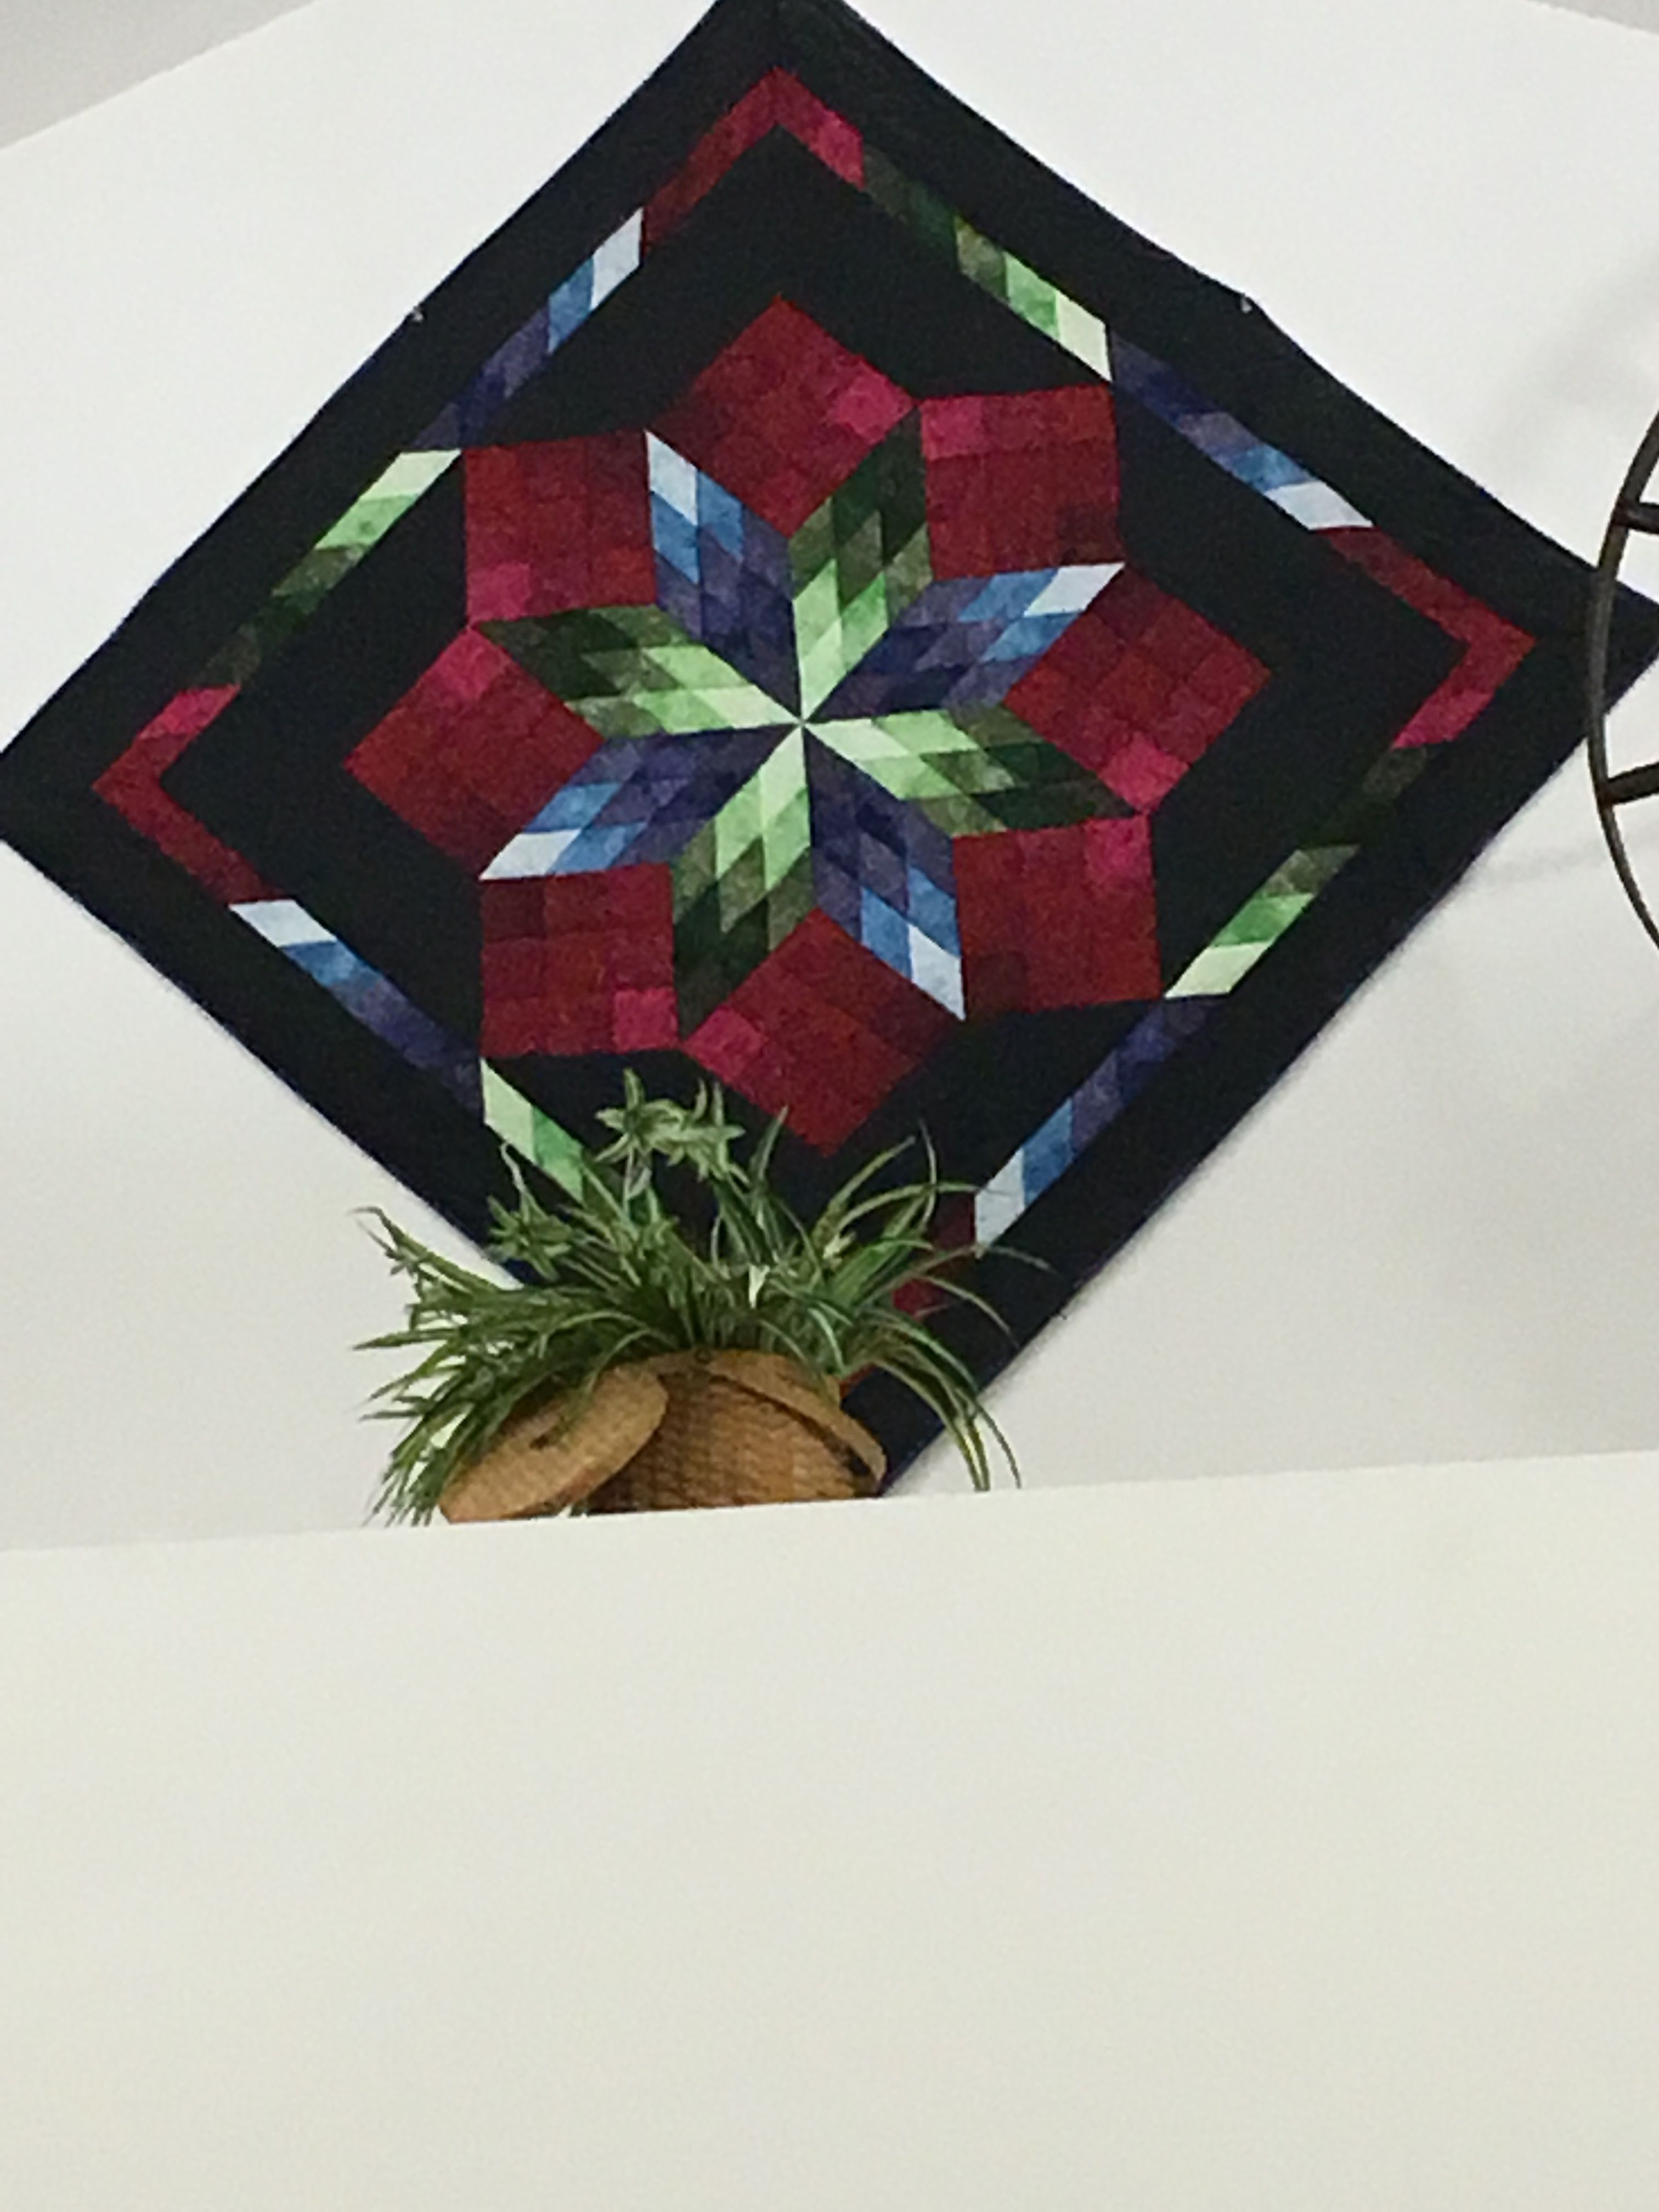 Amish Quilt at Shipshewana Quilts Pinterest